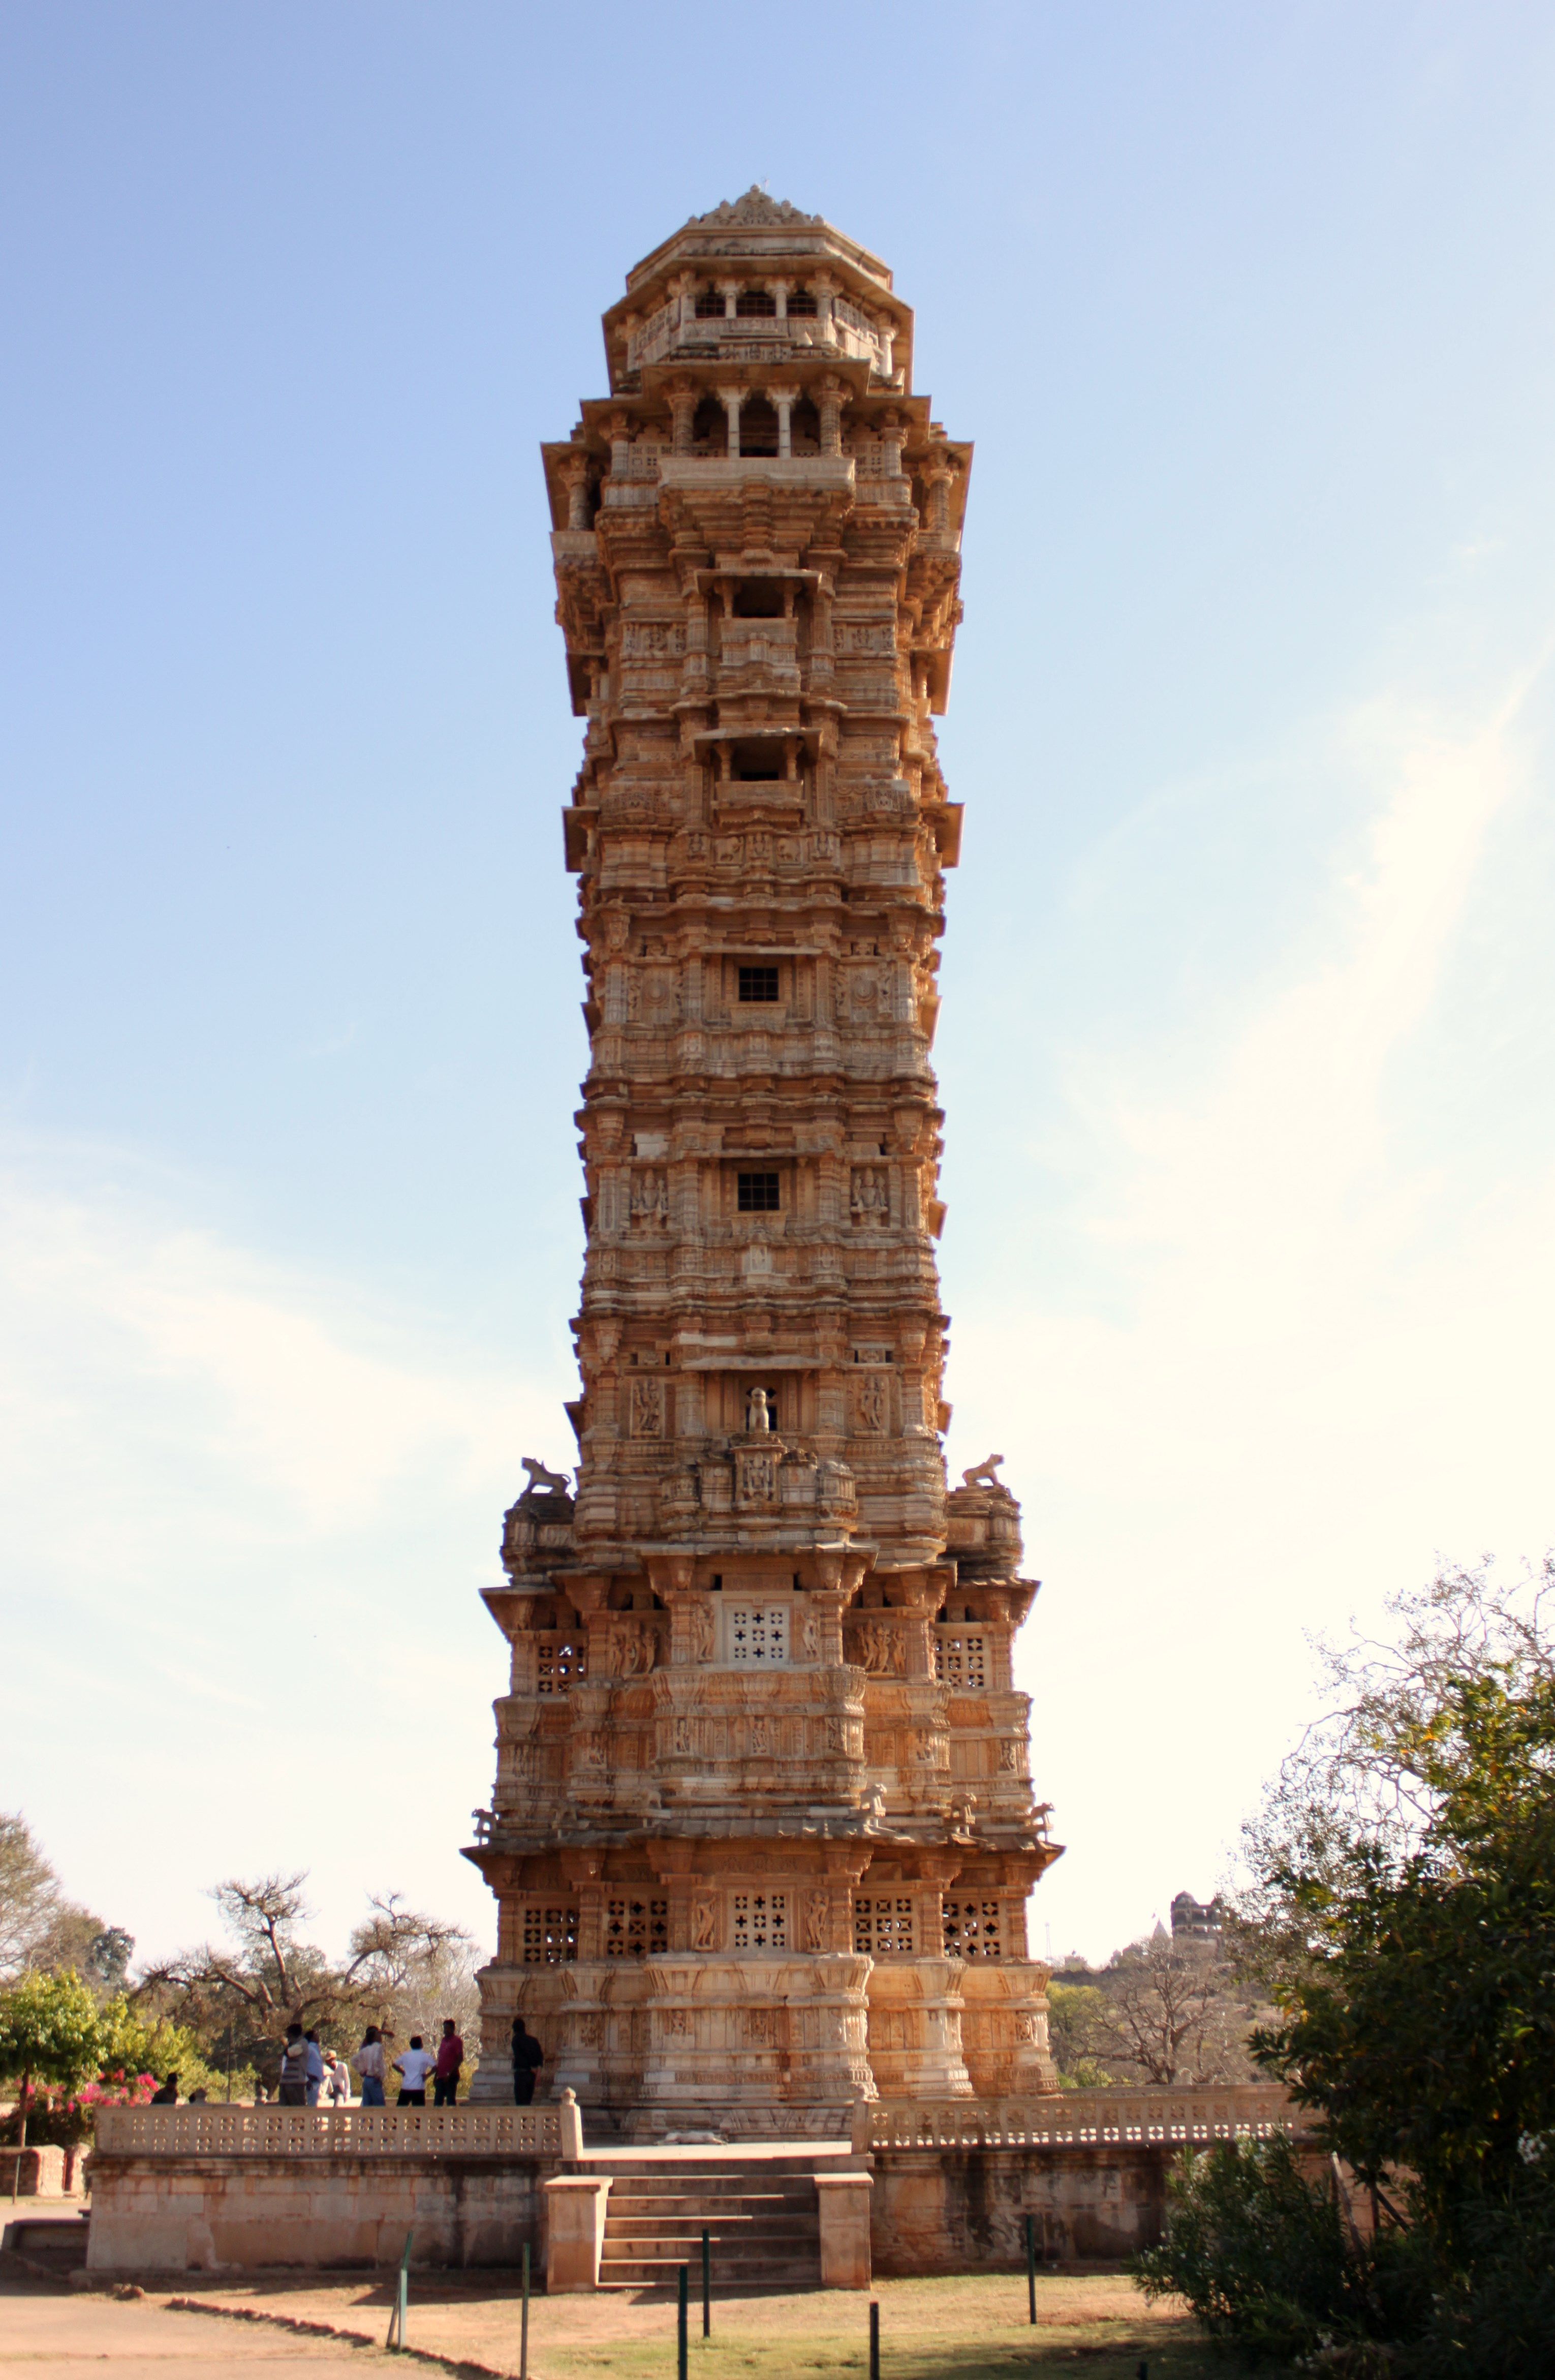 Vijay Stambha (Tower of Victory) 10